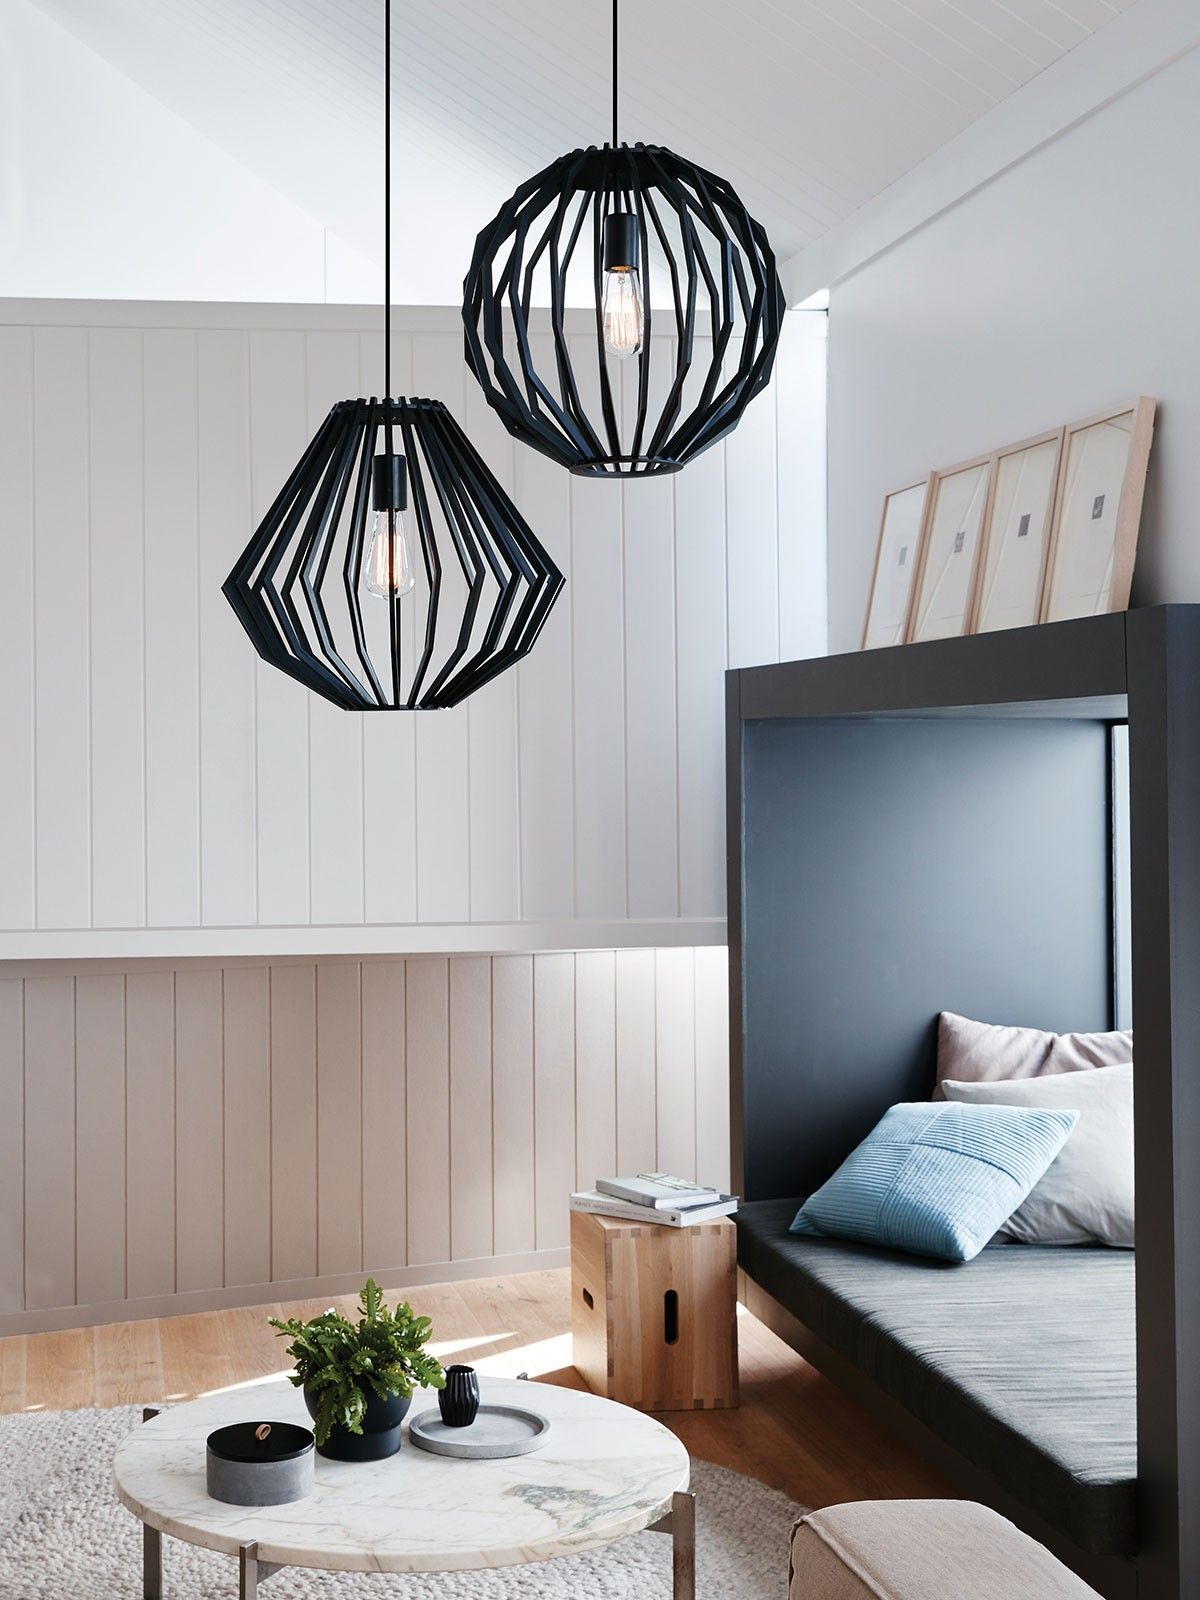 Walderik large round pendant in black interior house ideas